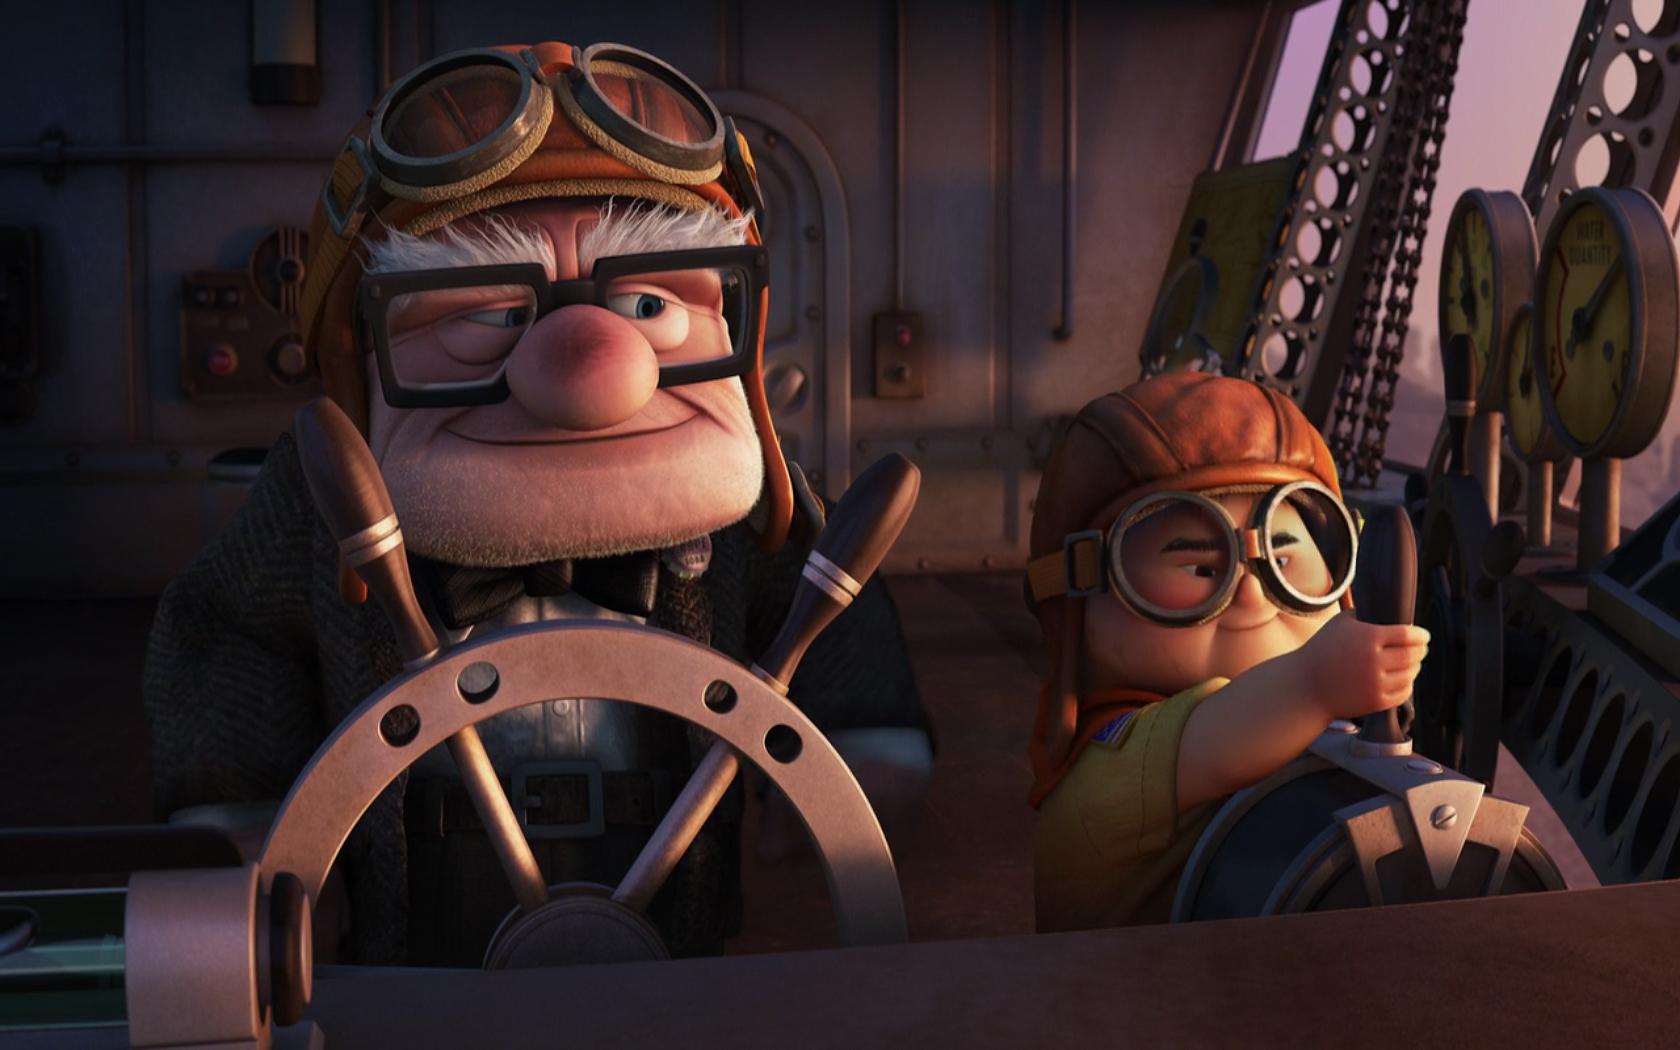 Pixar quotUpquot Wallpaper 1 by pwn247 1680x1050